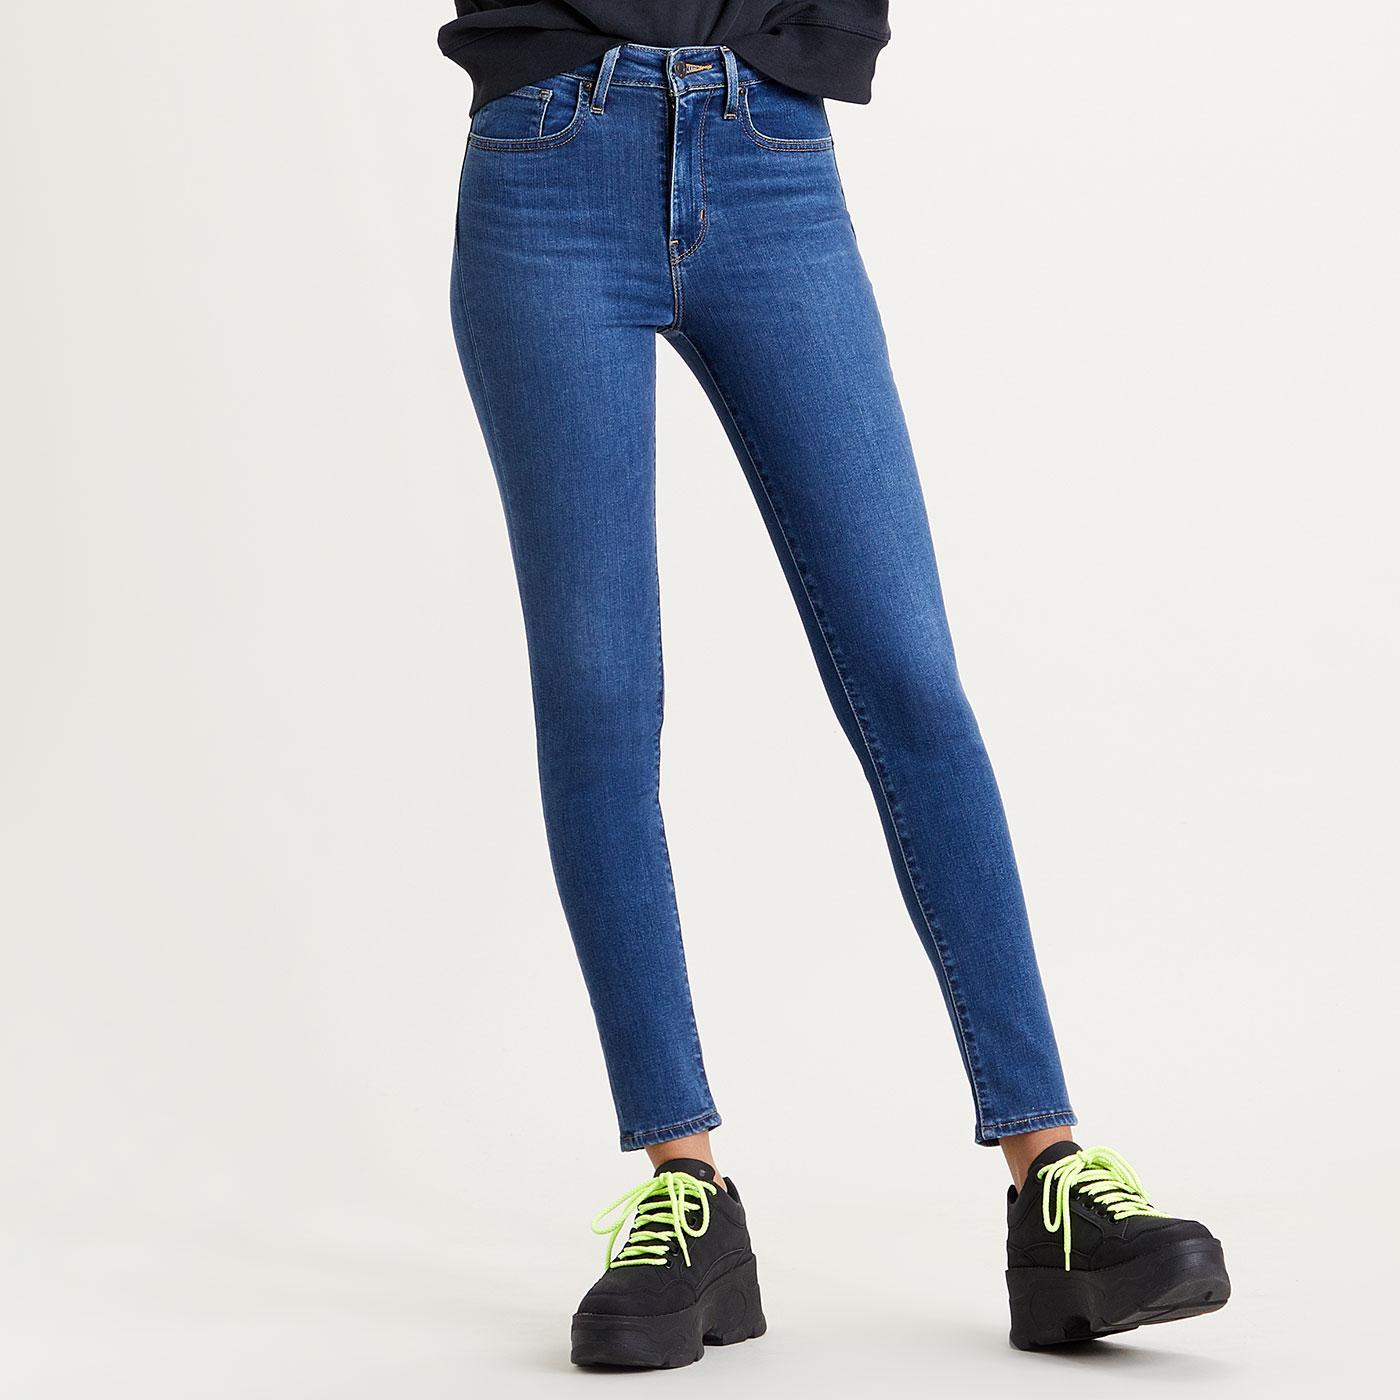 LEVI'S 721 High Rise Skinny Jeans - Bogota Fun